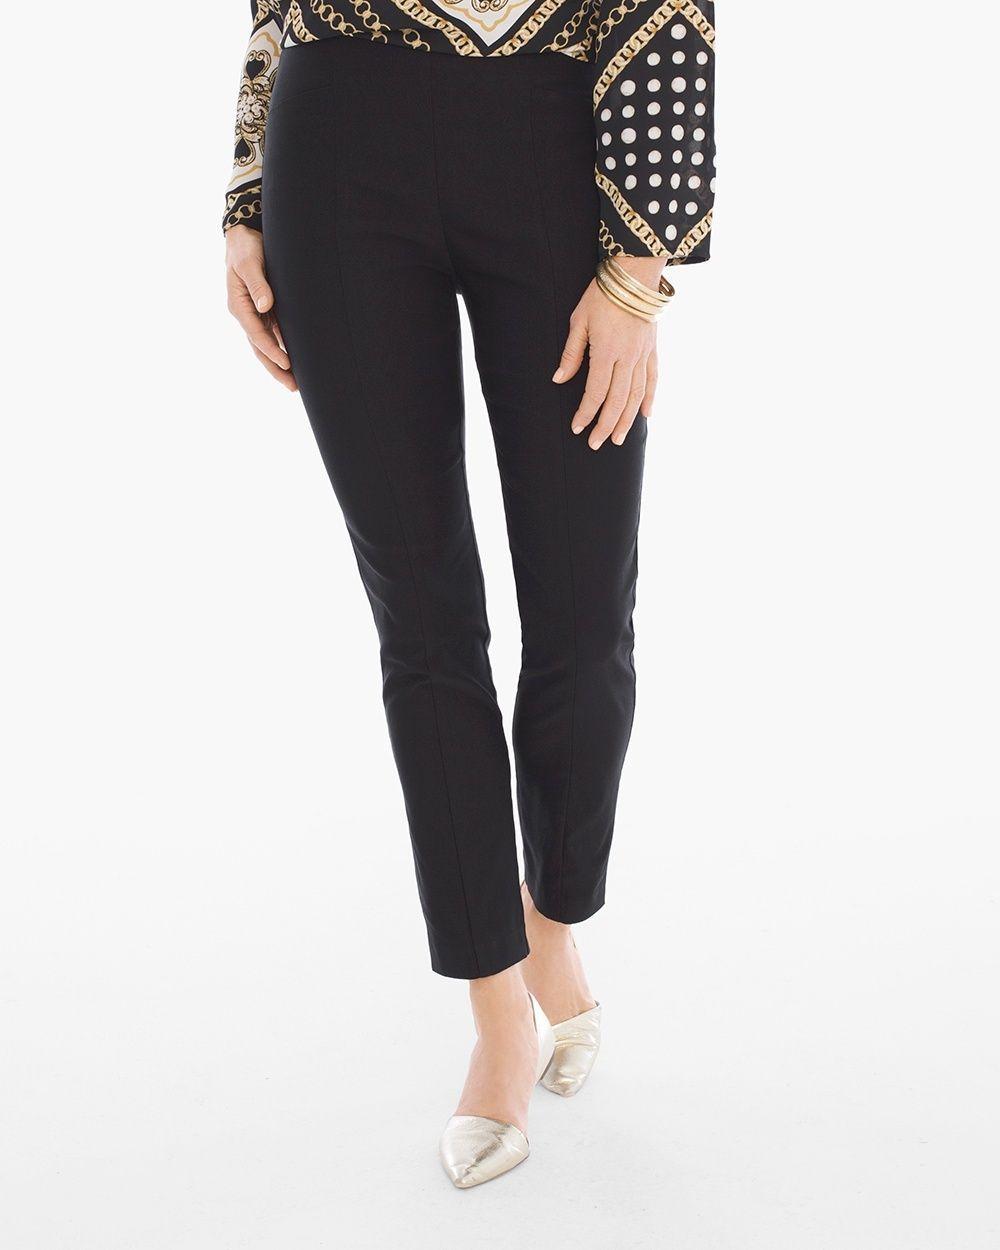 ff5945739028 Chico's Women's So Slimming Brigitte Ankle Pants, Black, Size: 4 (20 - XXL)  REG